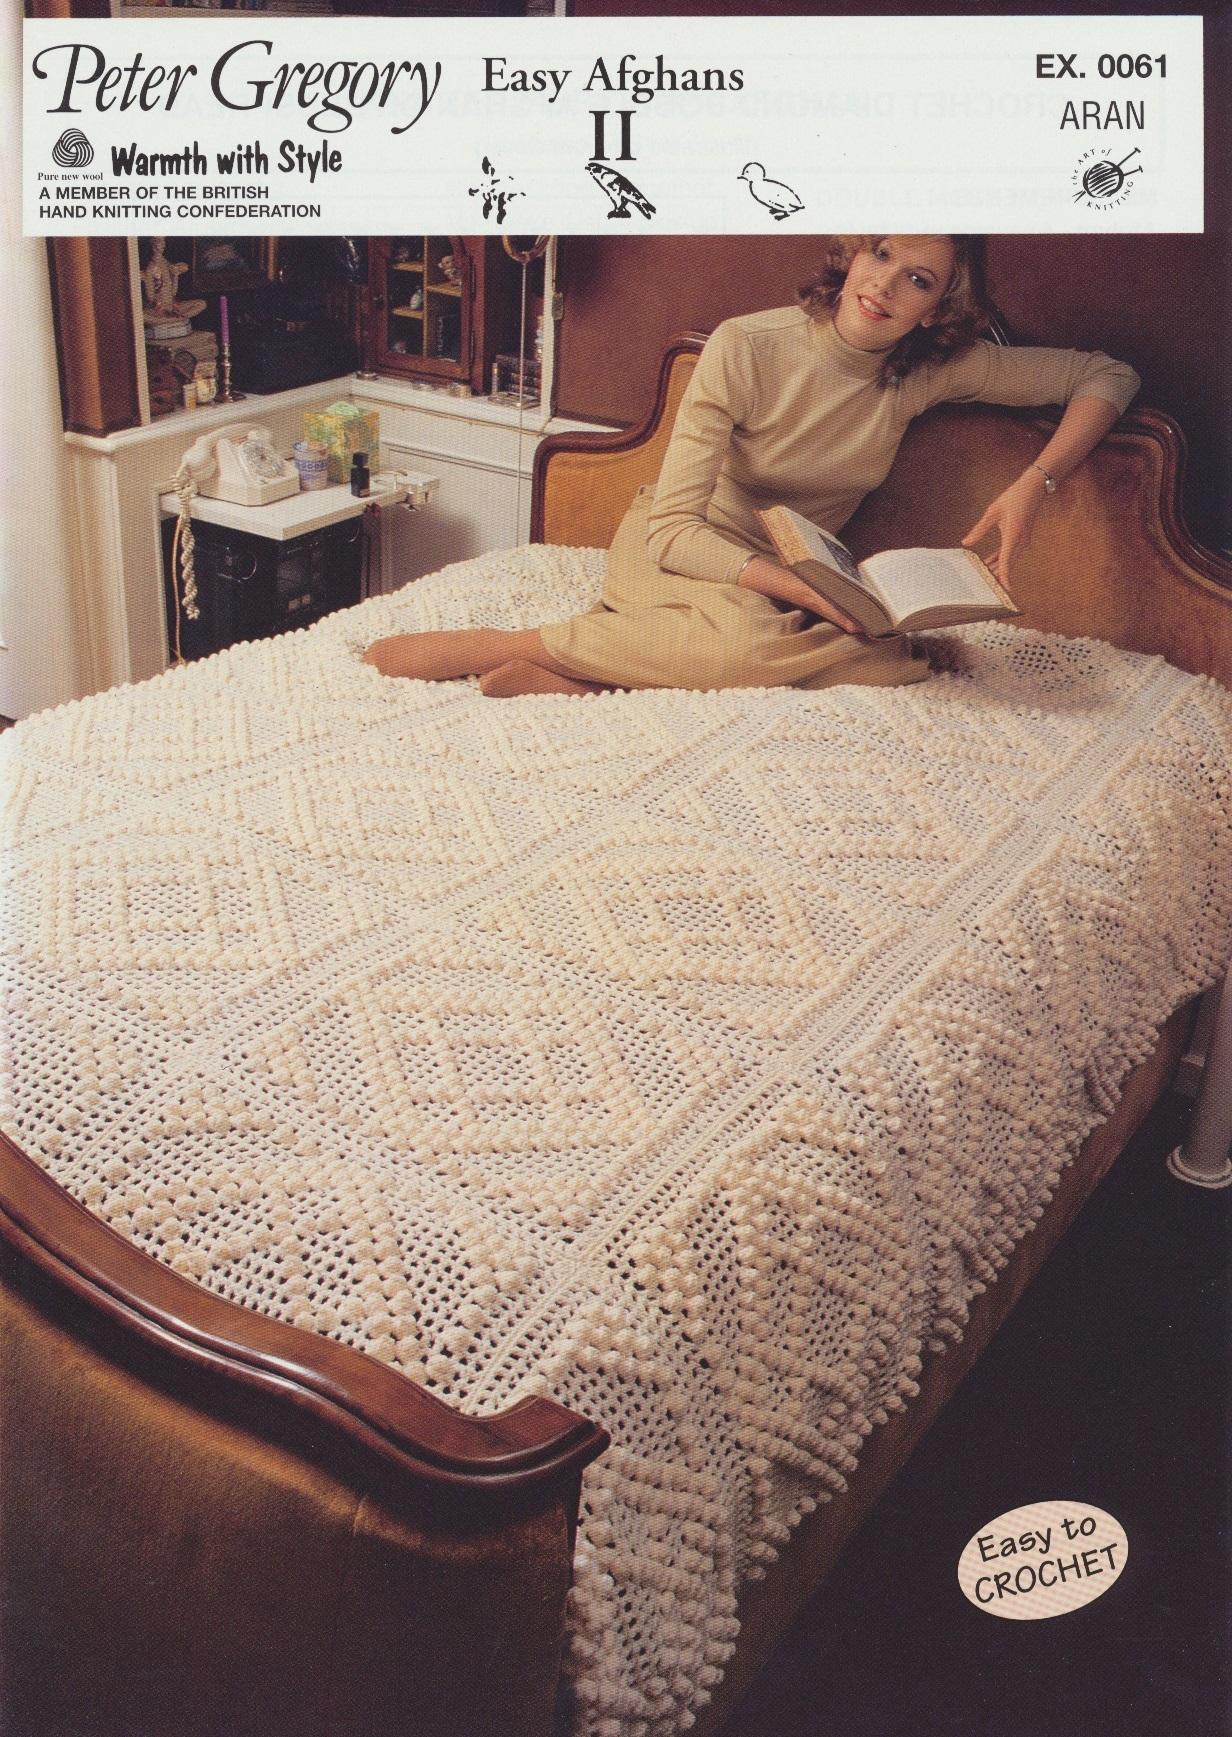 Scarves Knitting Patterns Free : Peter Gregory Aran Strickende Hakeln Muster Einfach Afghanen Tagesdecke EX006...